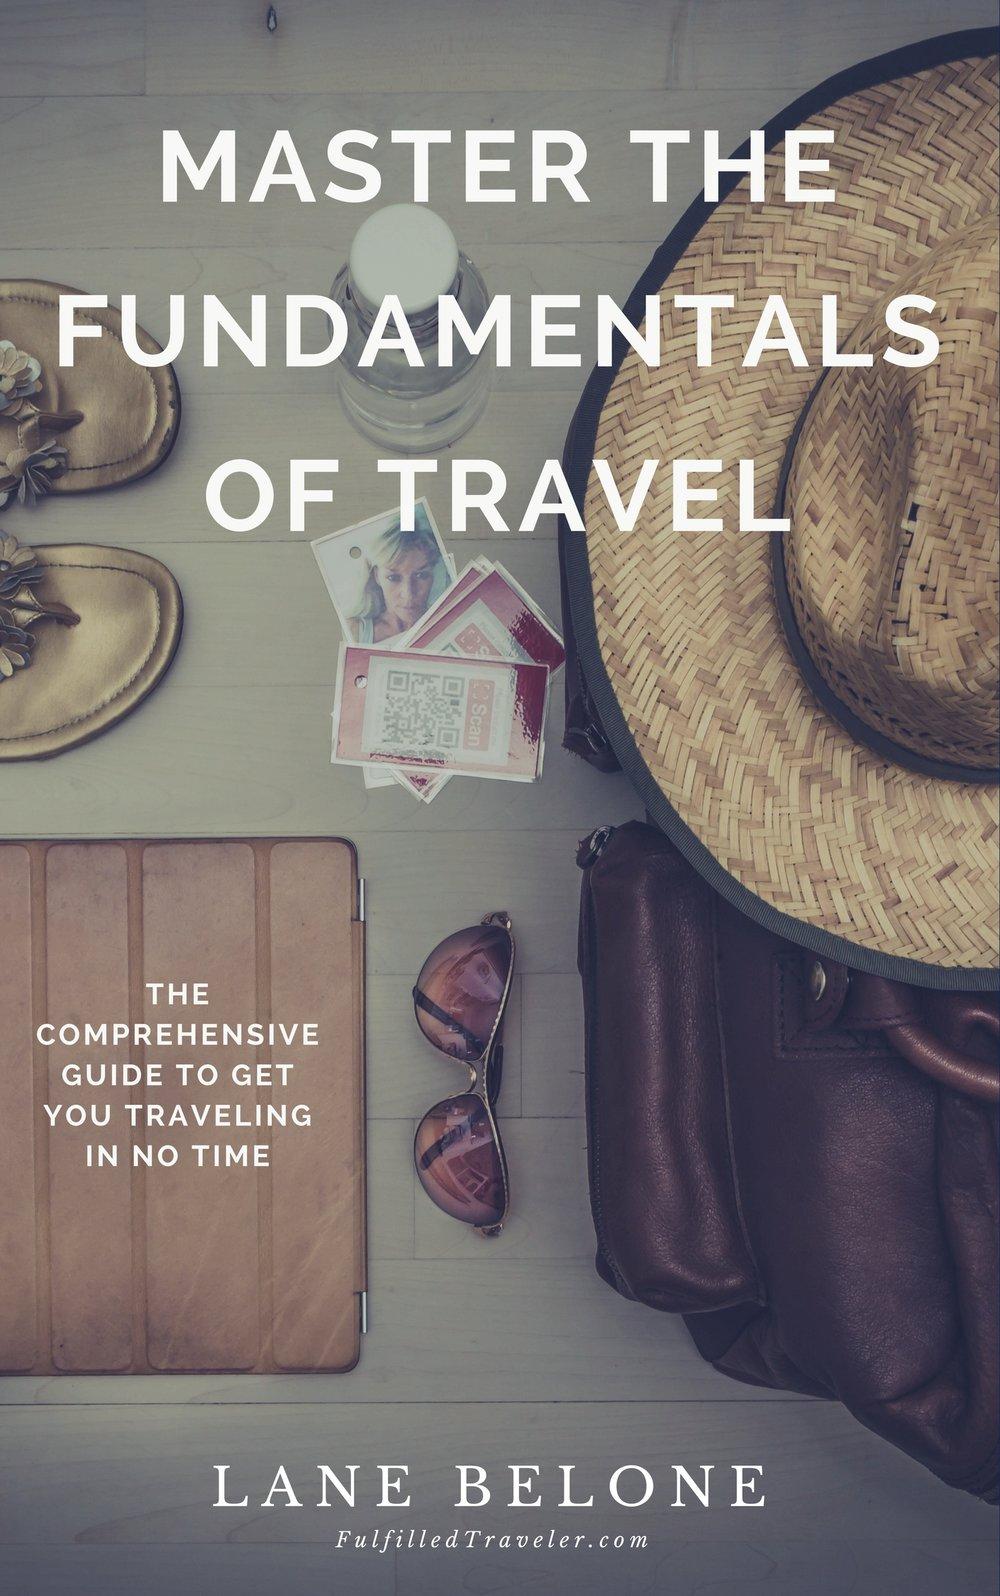 Master the Travel Fundamentals Book Cover (JPEG).jpg